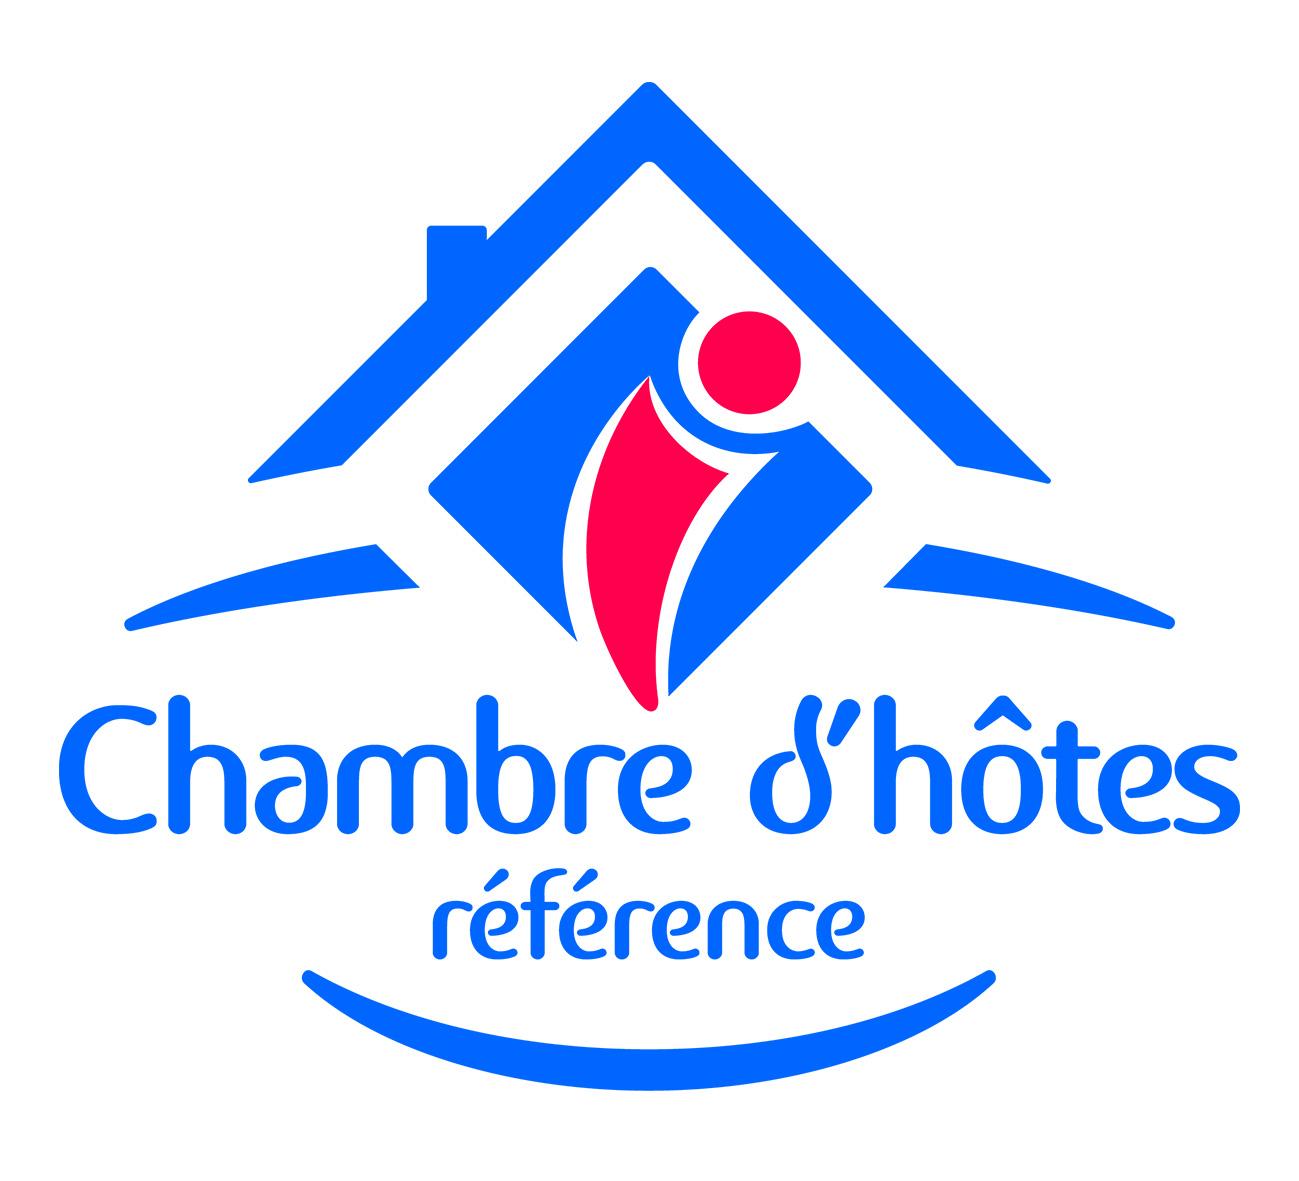 Logo Chambre d\'ho^tes référence.jpg